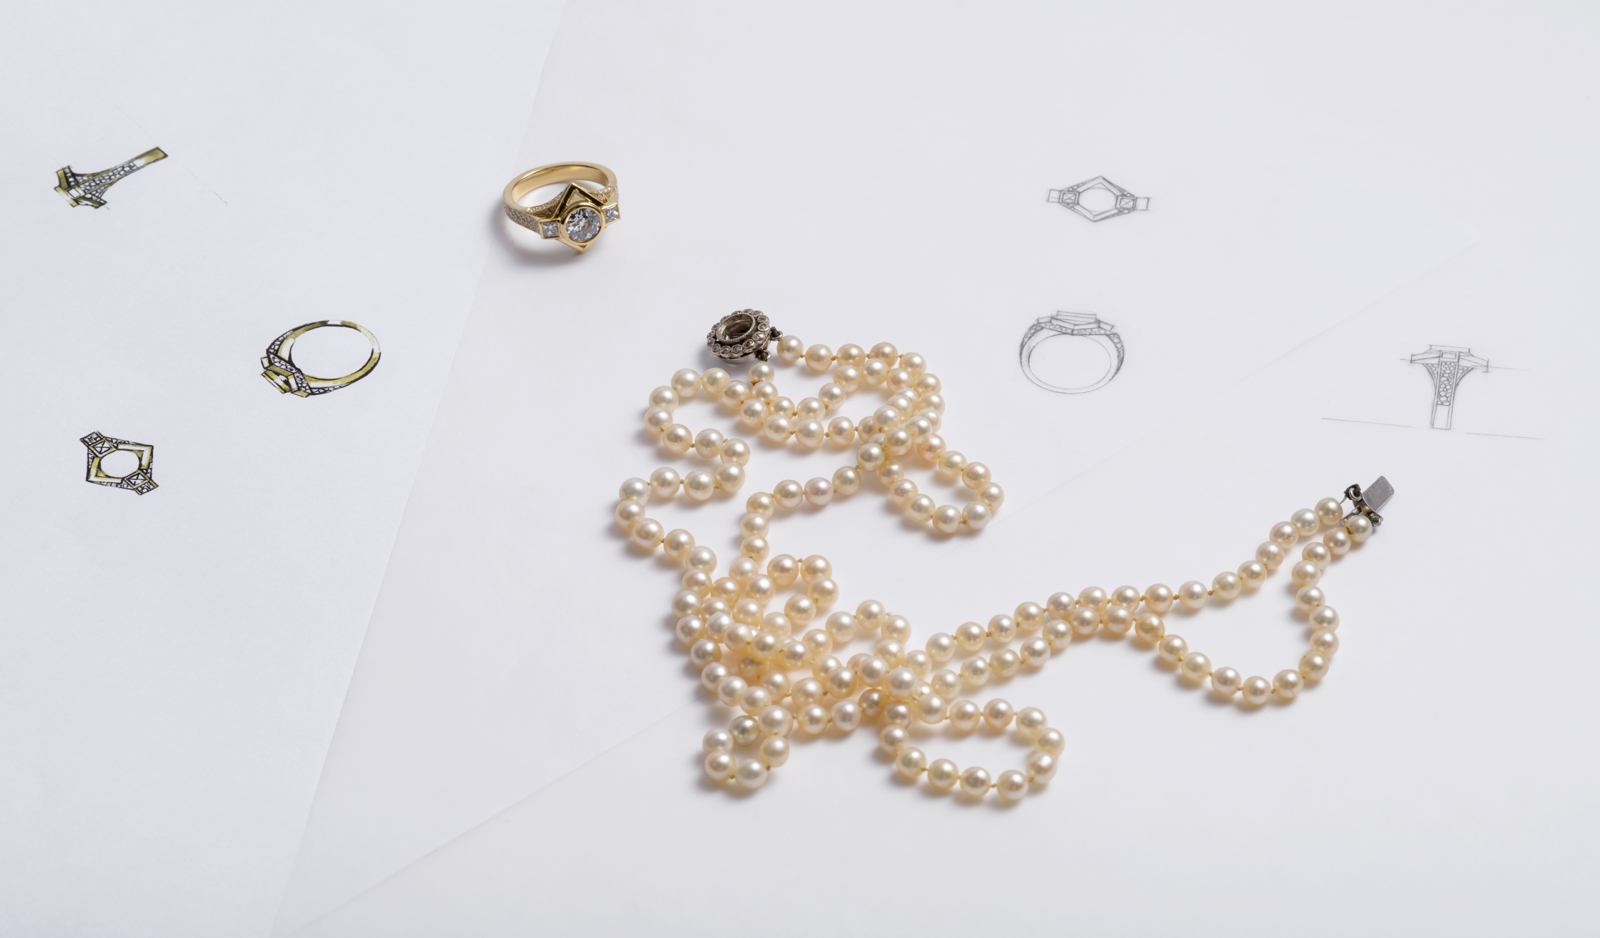 bespoke engagement ringing pearl necklace